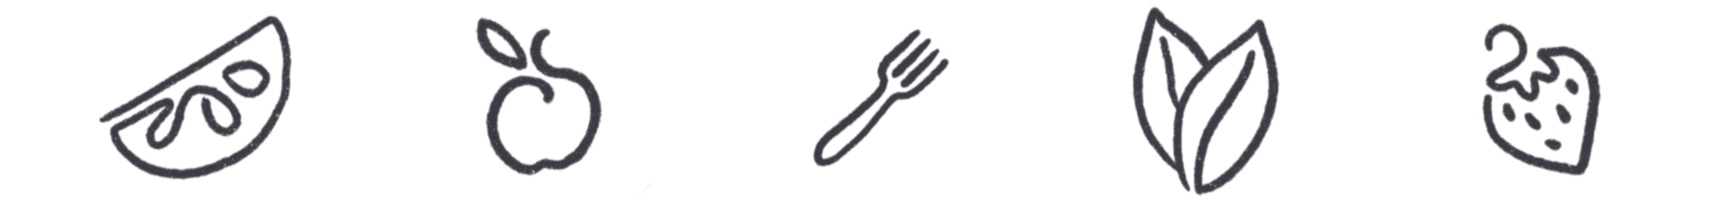 Atlanta Lunch Co. Orange, Apple, Fork, Leaf and Strawberry Illustrations